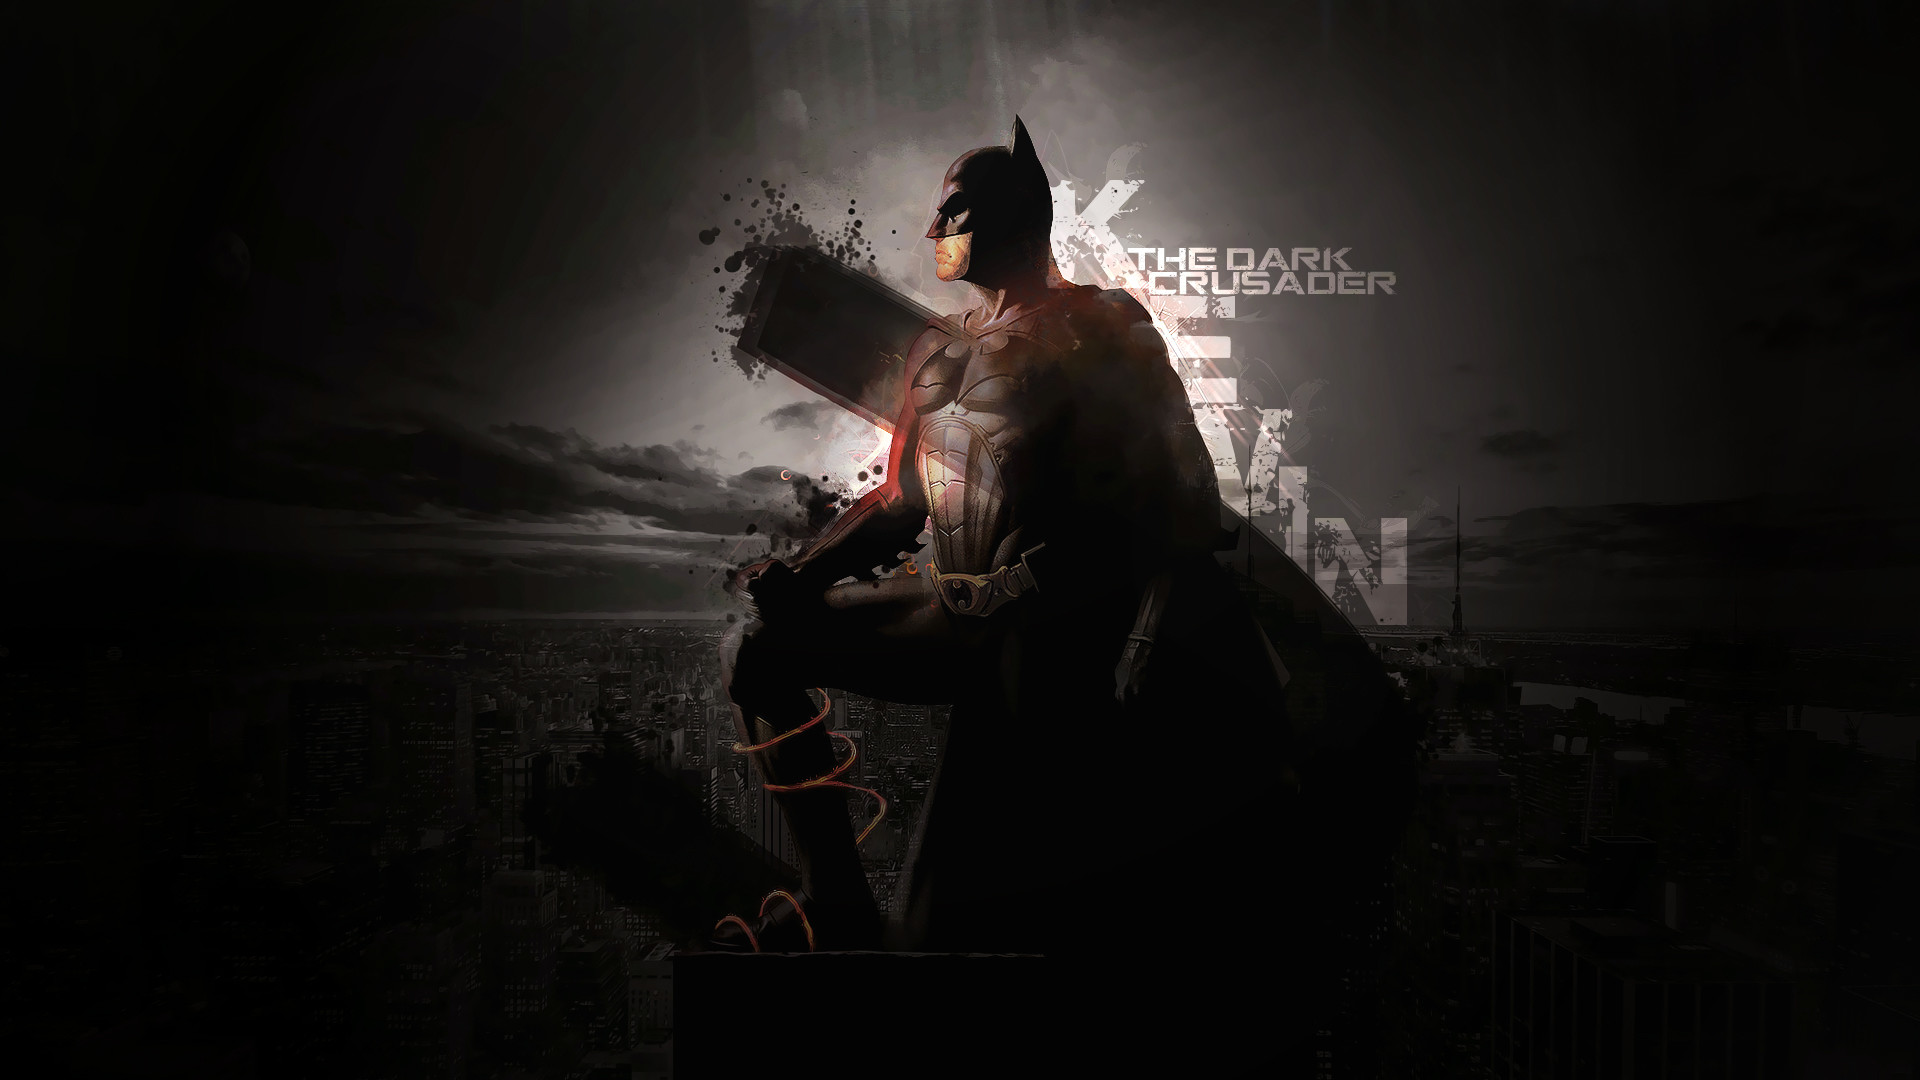 Res: 1920x1080,  Superb HQ Definition Images of New Batman, Full HD 1080p Desktop  Images